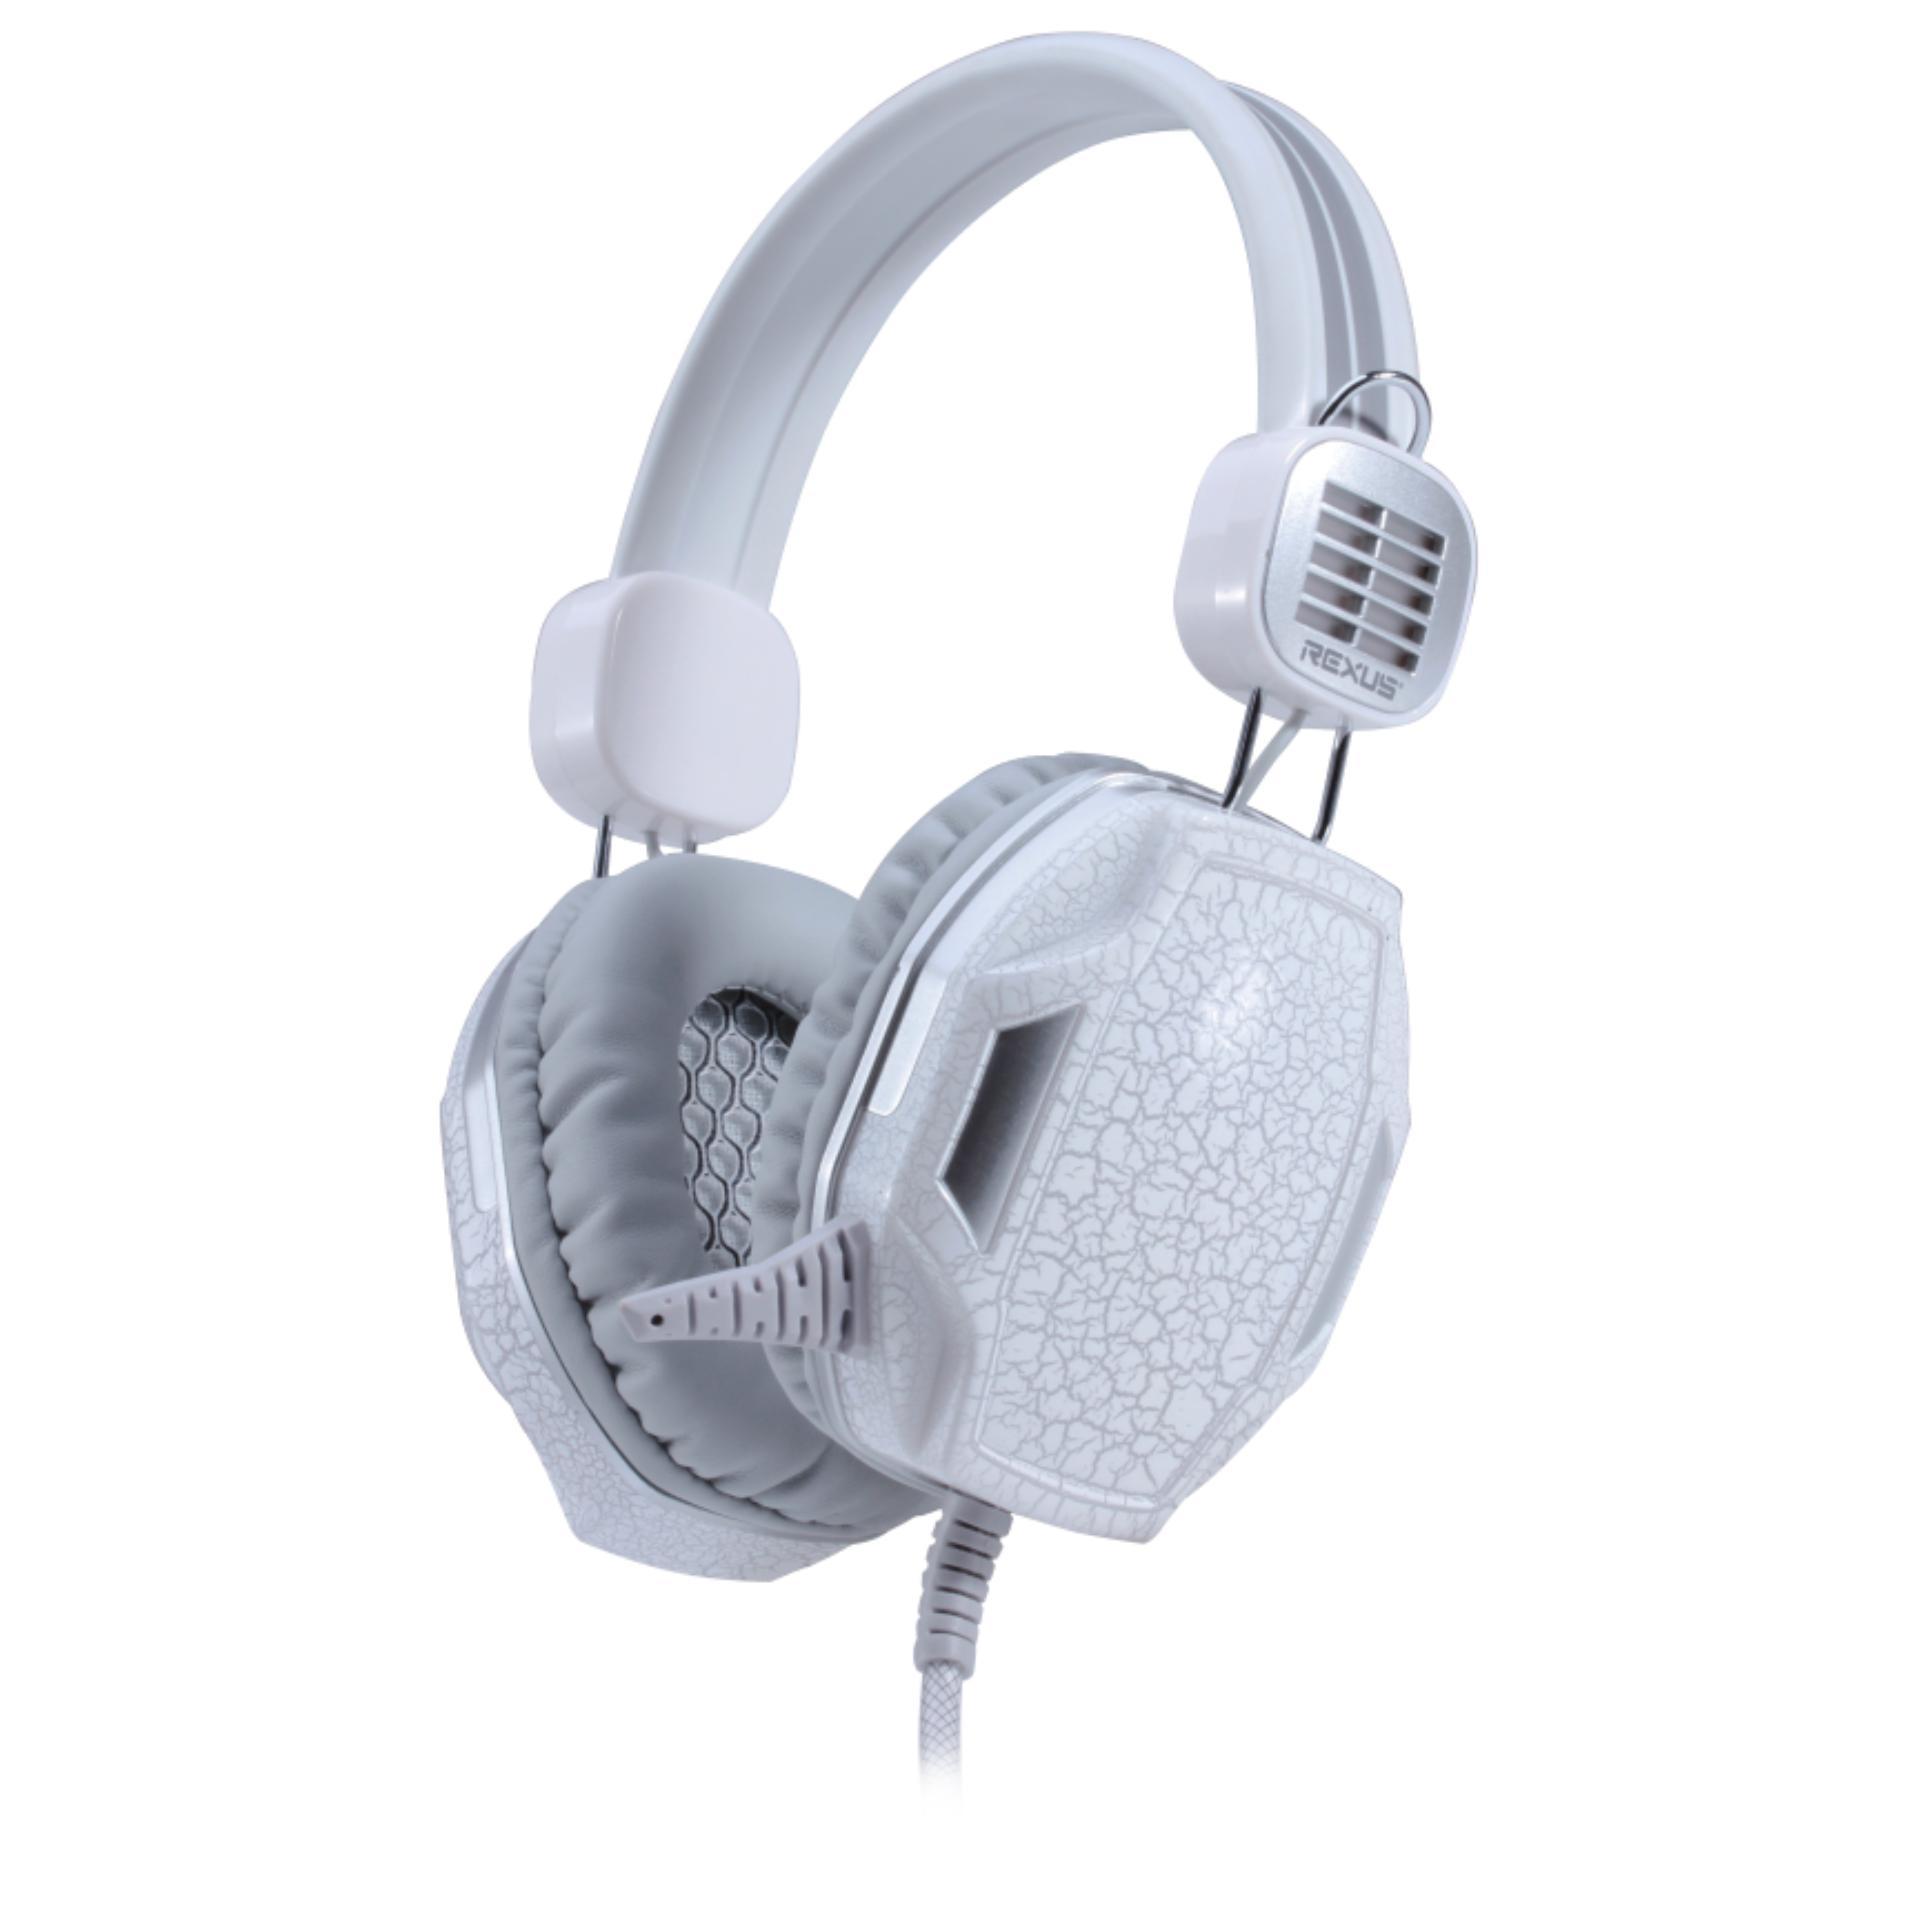 Rexus Headset Gaming F17 F 17 Vonix Headphone Head Set Ear Earphone White